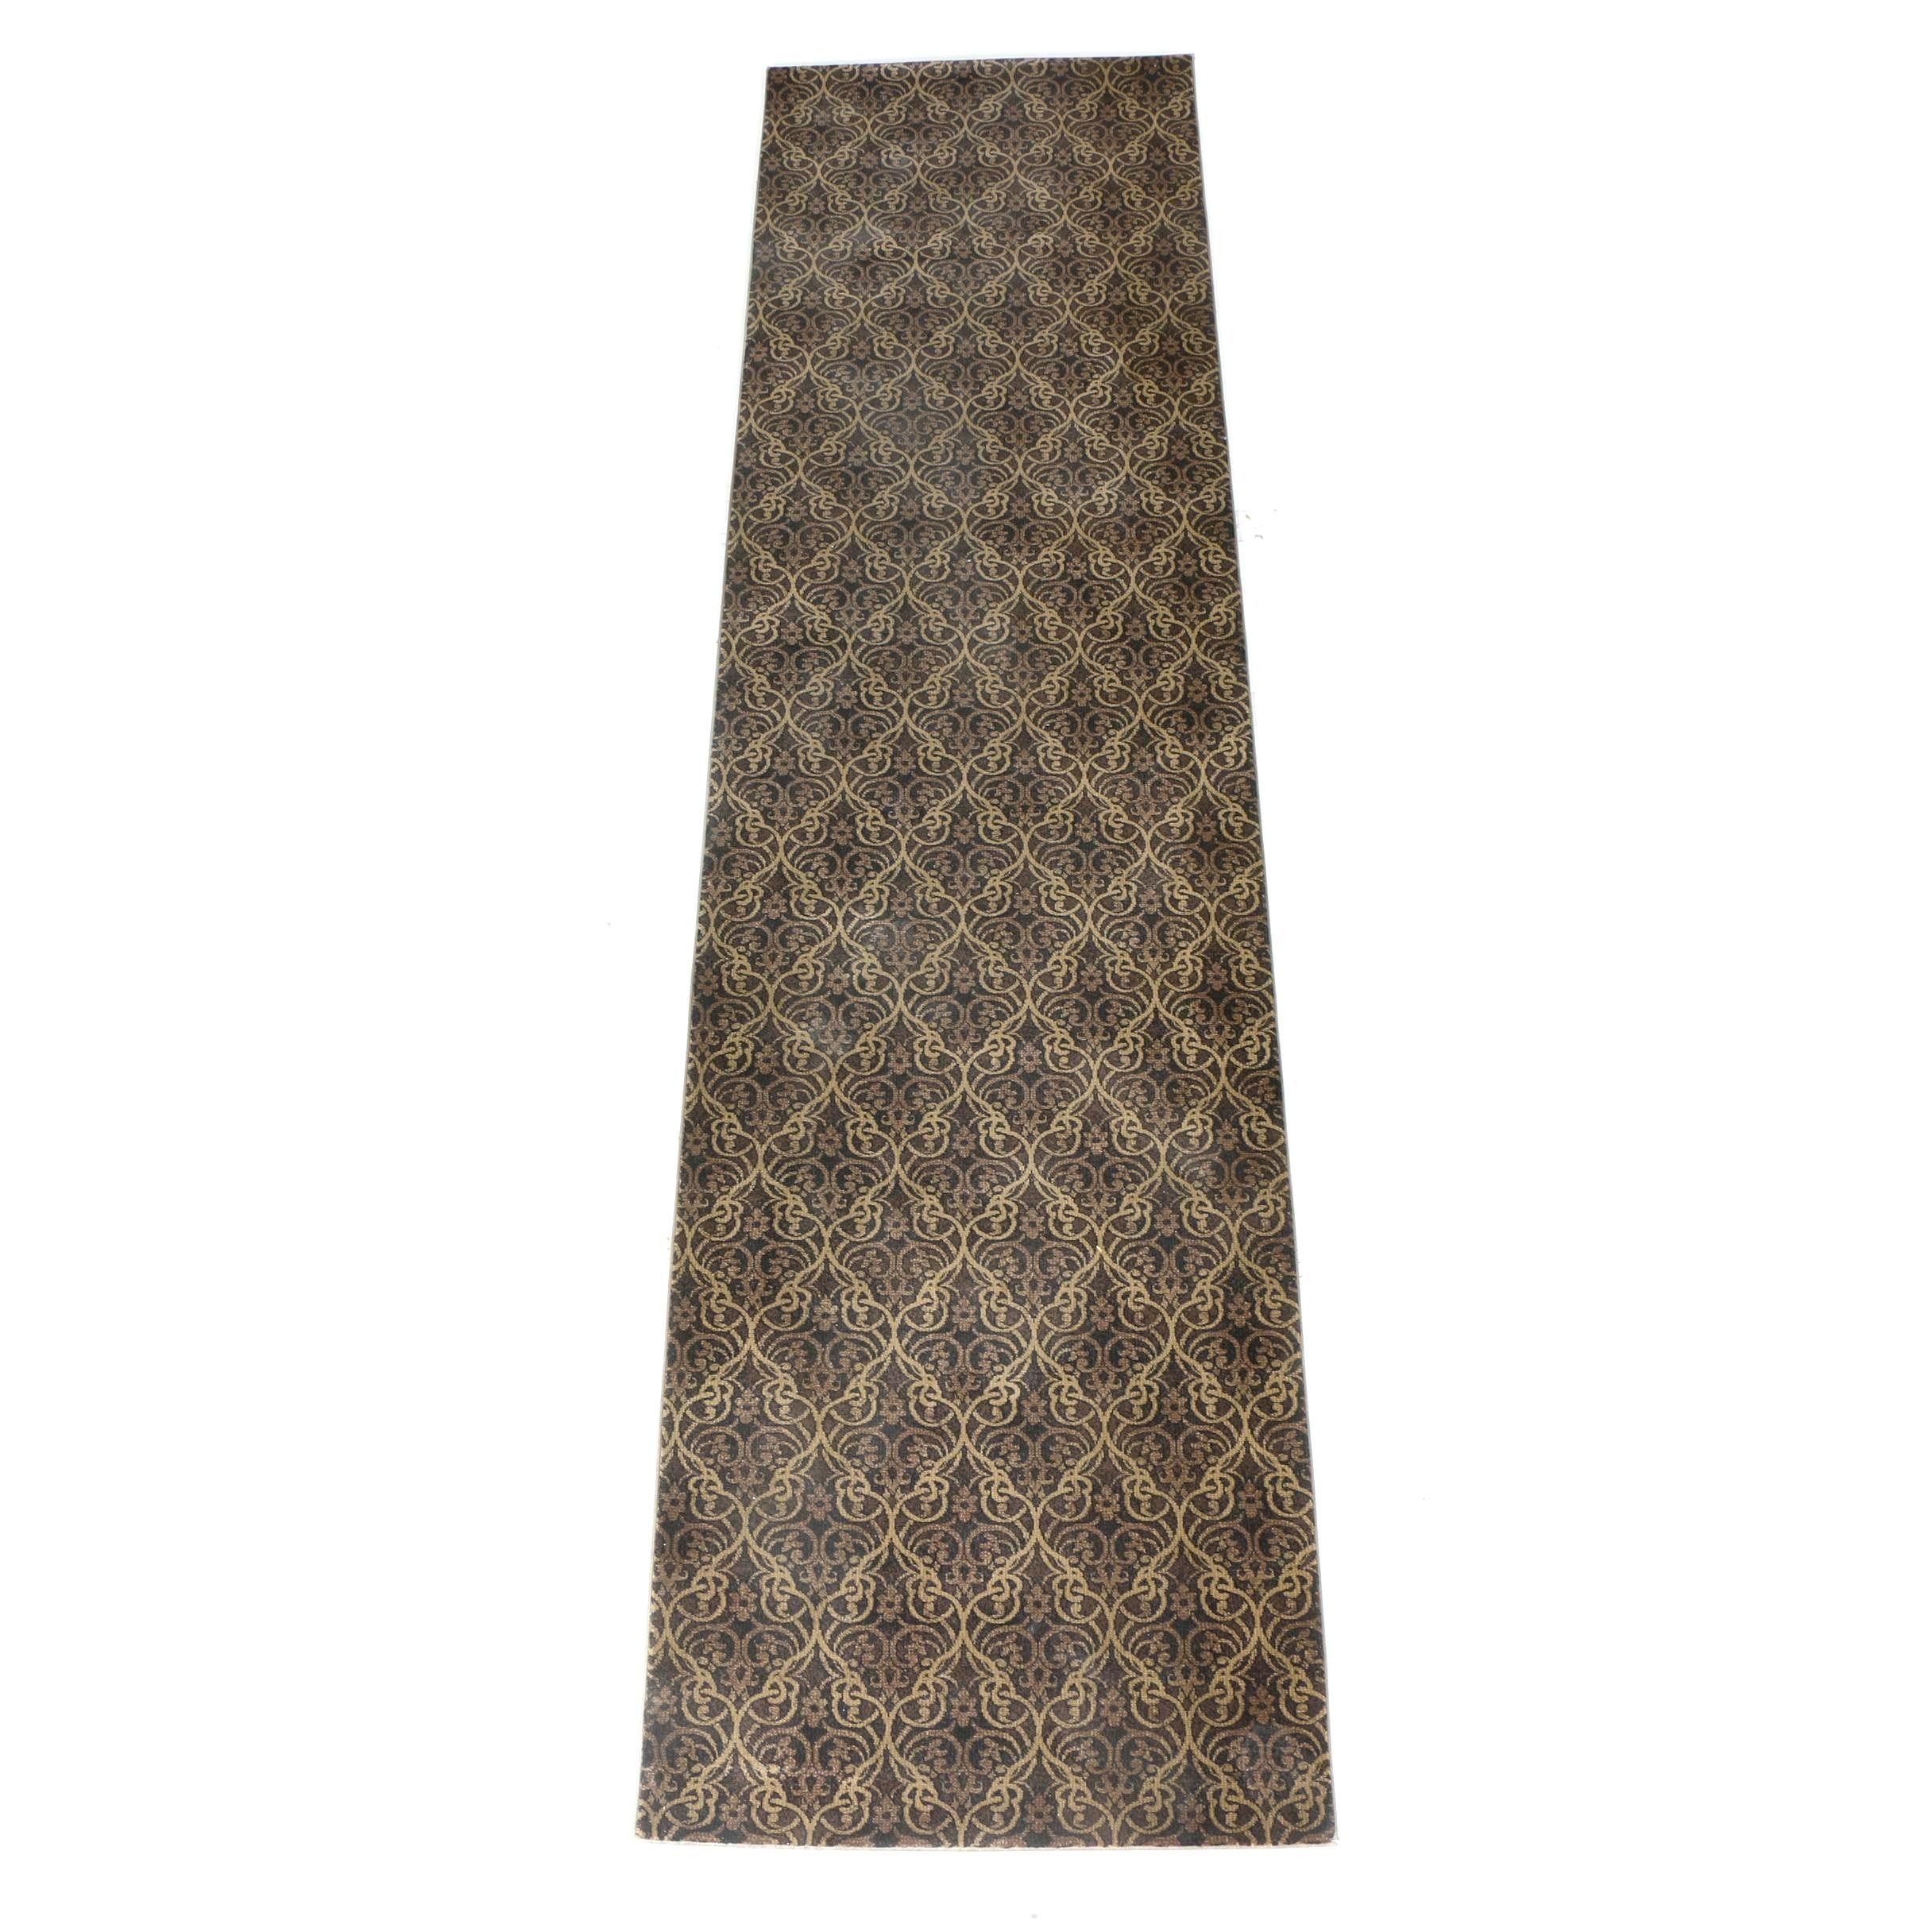 Power-Loomed Contemporary Wool Carpet Runner